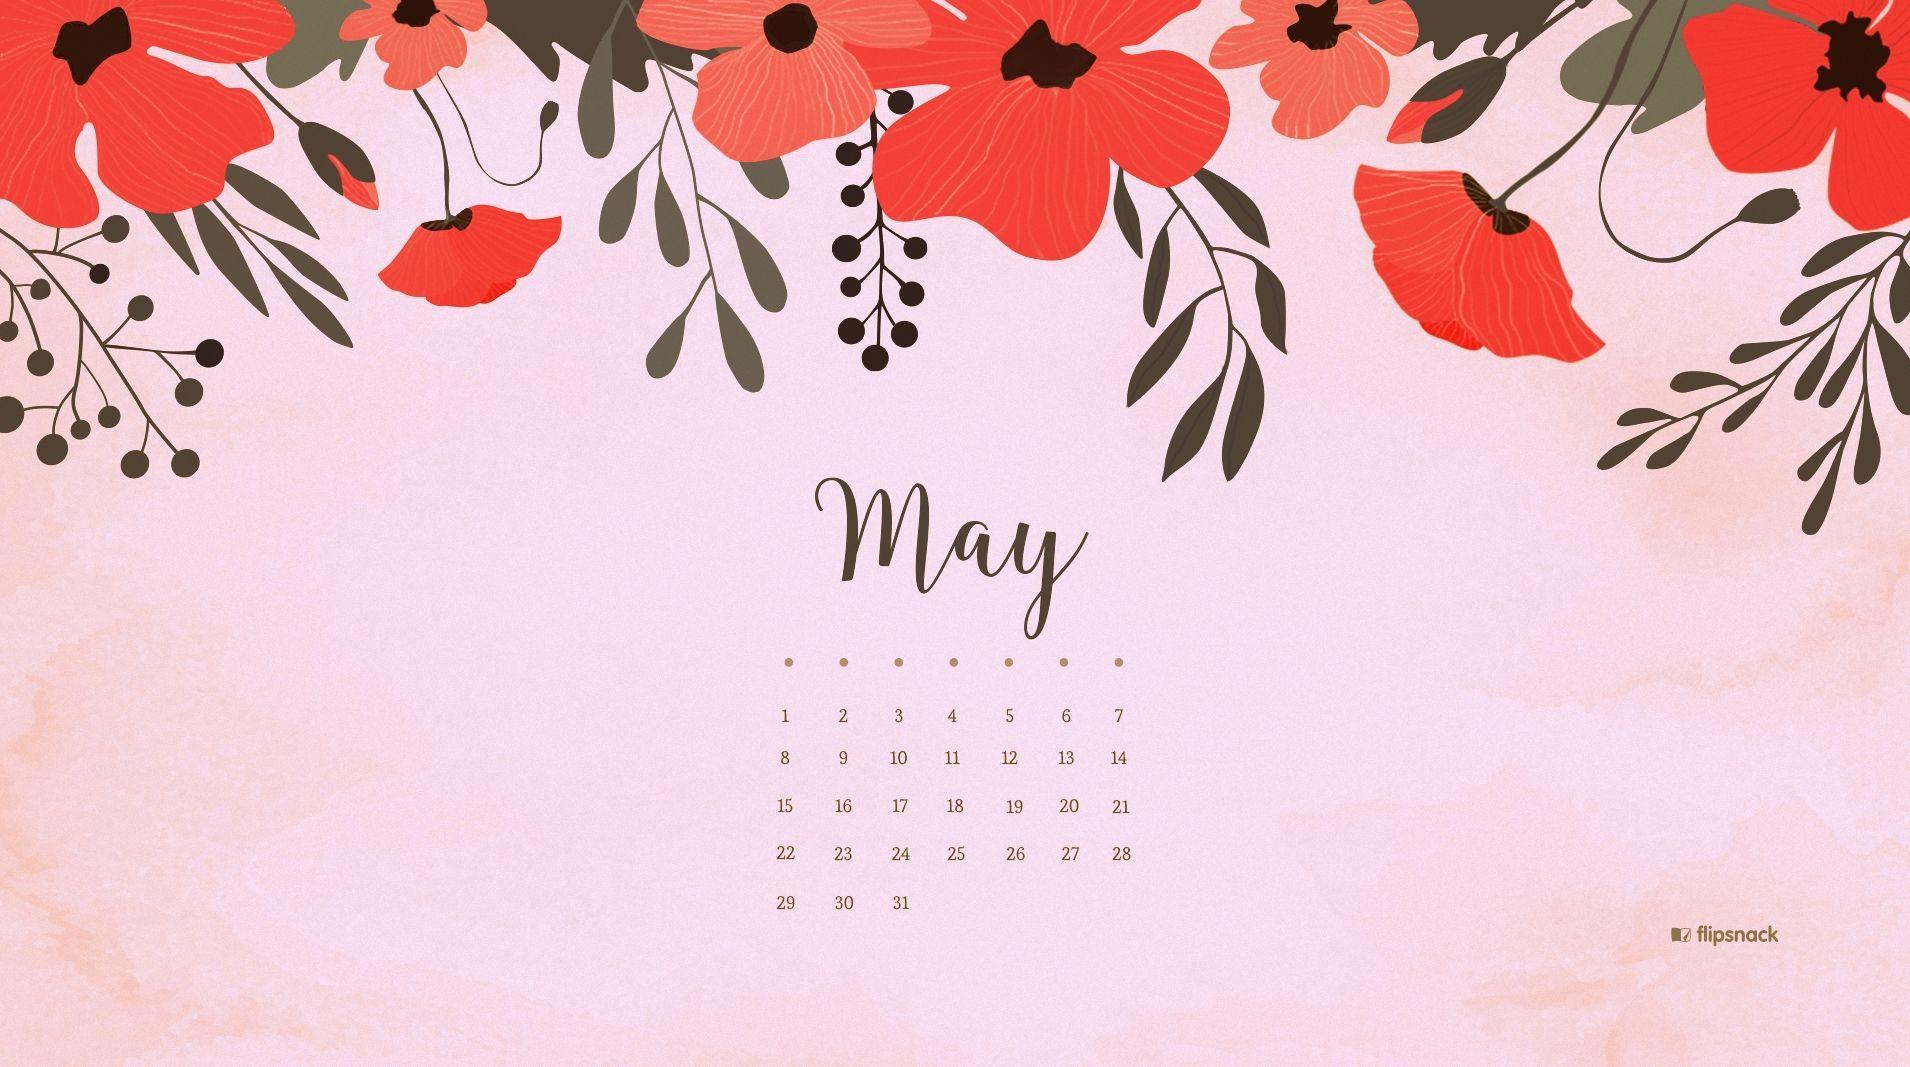 May 2018 Calendar Desktop Wallpaper Calendar Wallpaper Desktop Wallpaper Watercolor Wallpaper